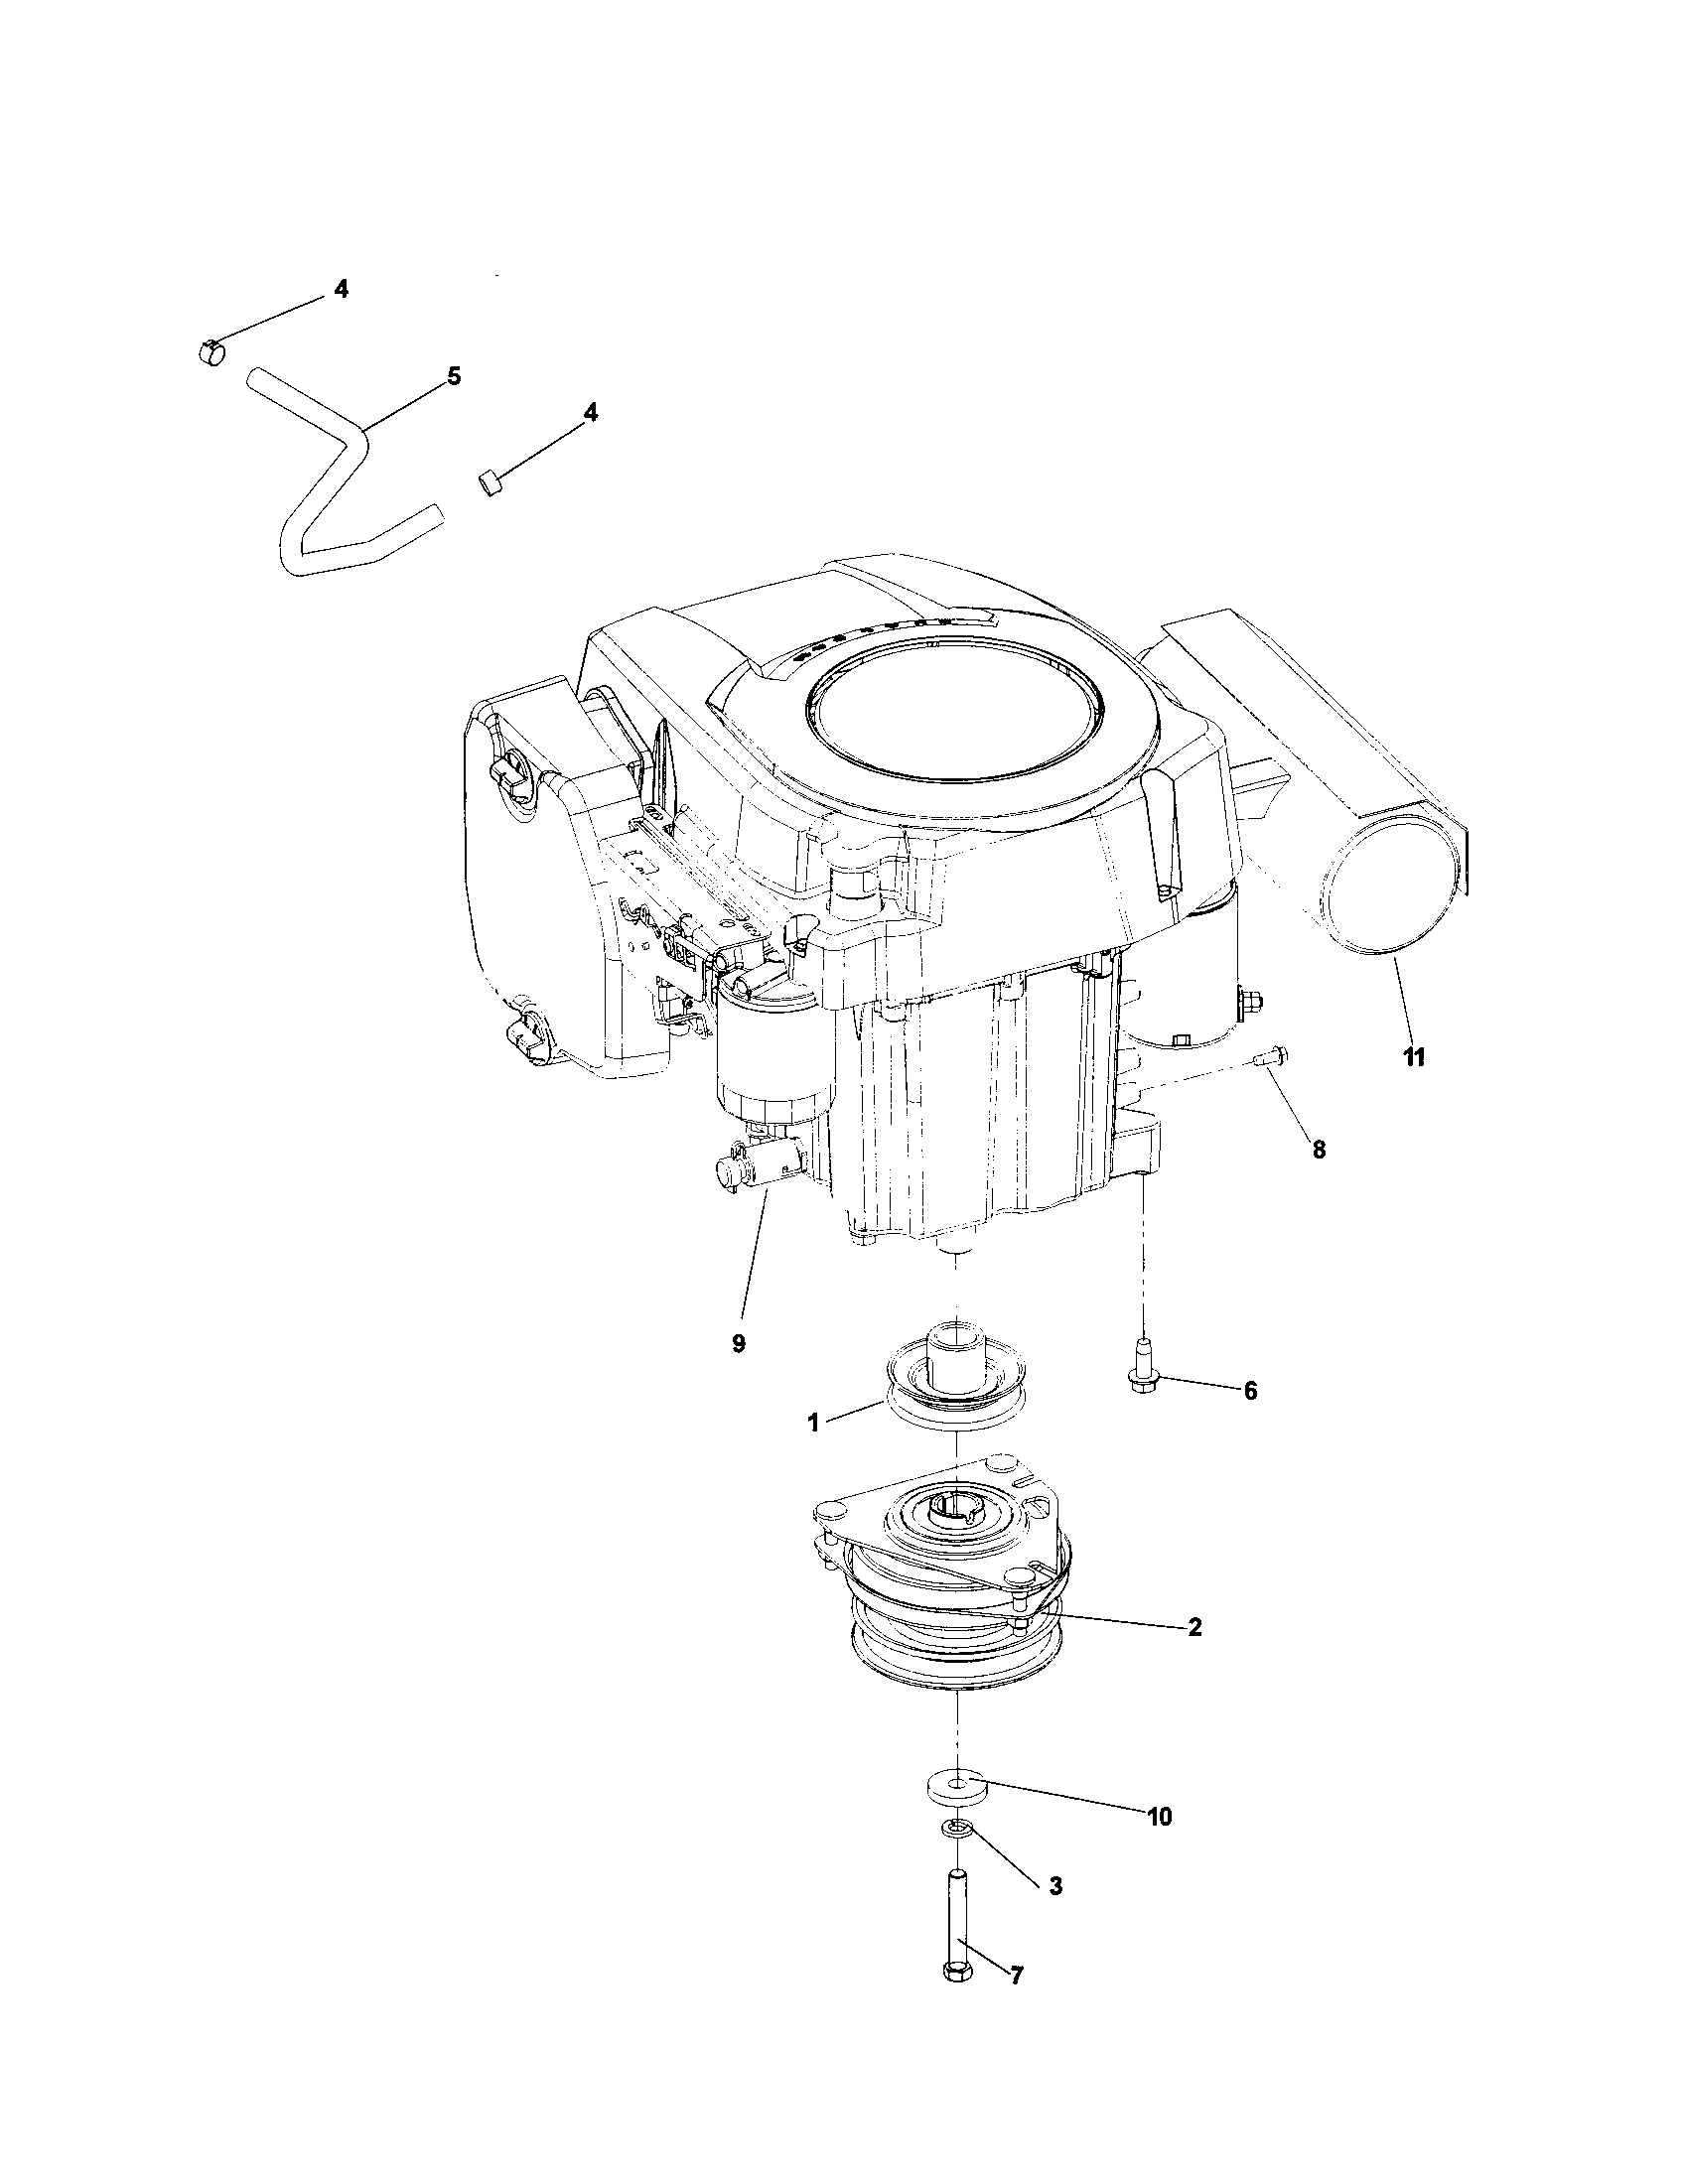 Husqvarna model CZ3815 lawn, riding mower rear engine